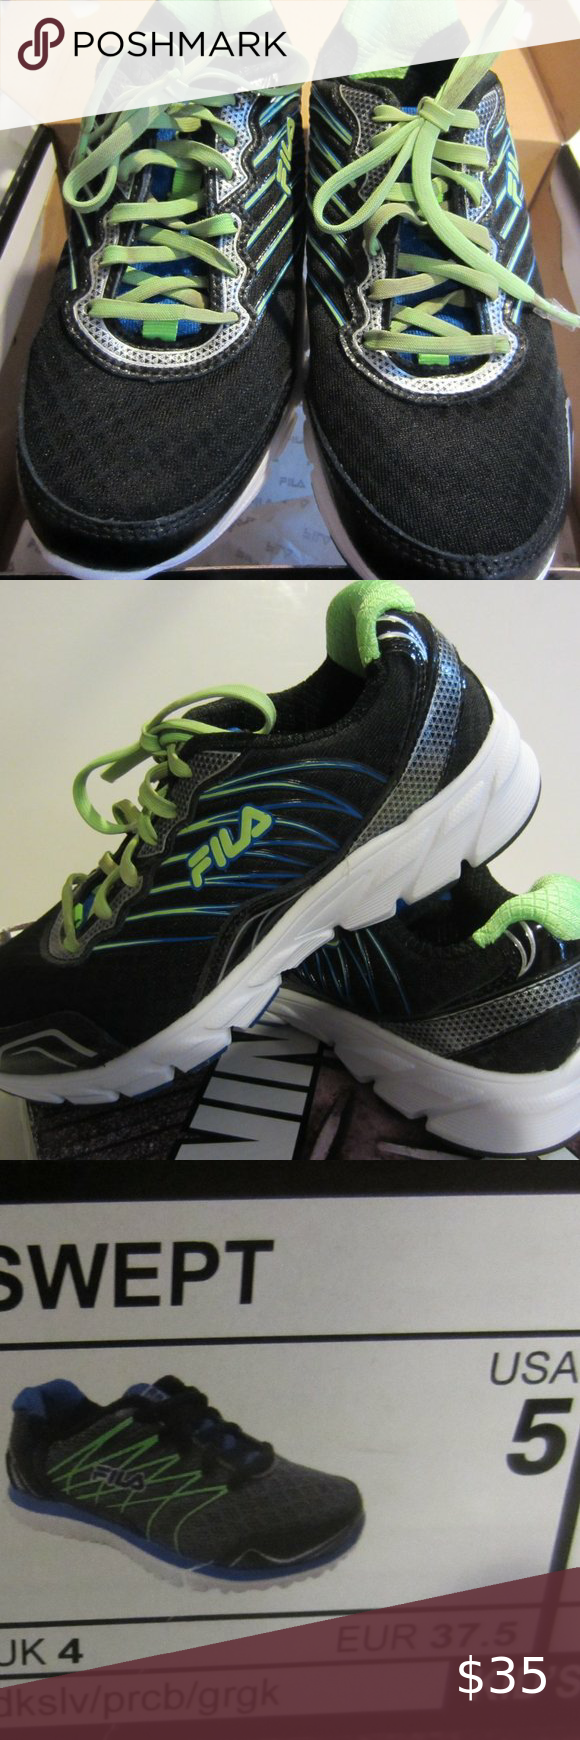 Boys Fila tennis shoes size 5 in 2020